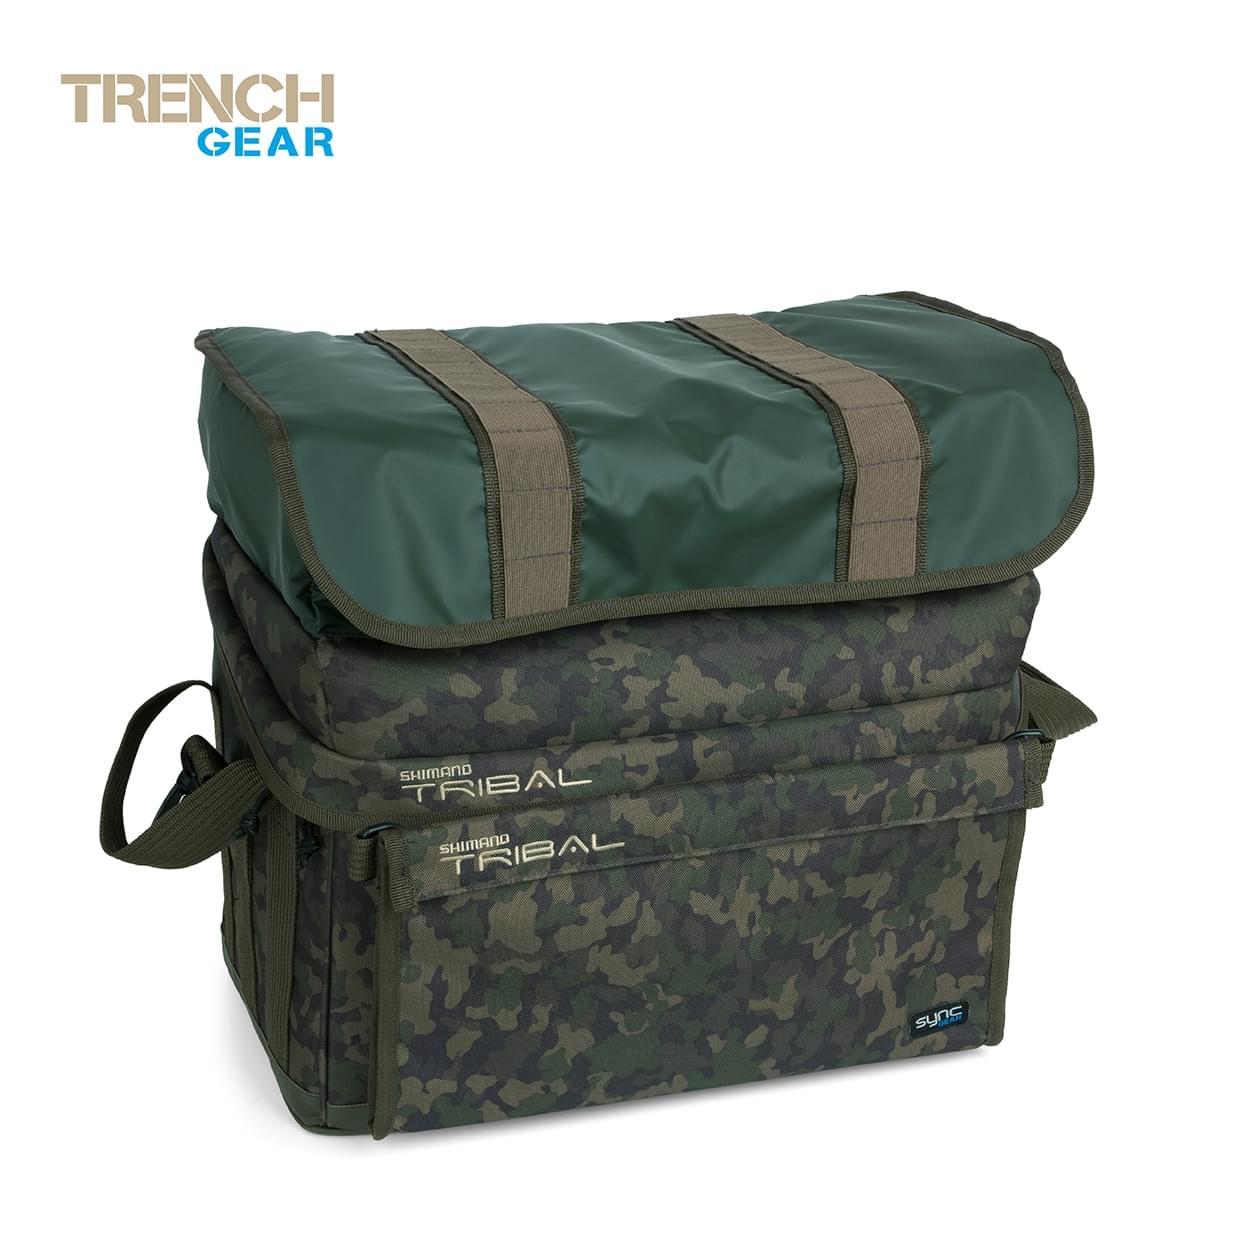 Shimano Trench Compact Carryall Incl. Aero Qvr Strap Advanced